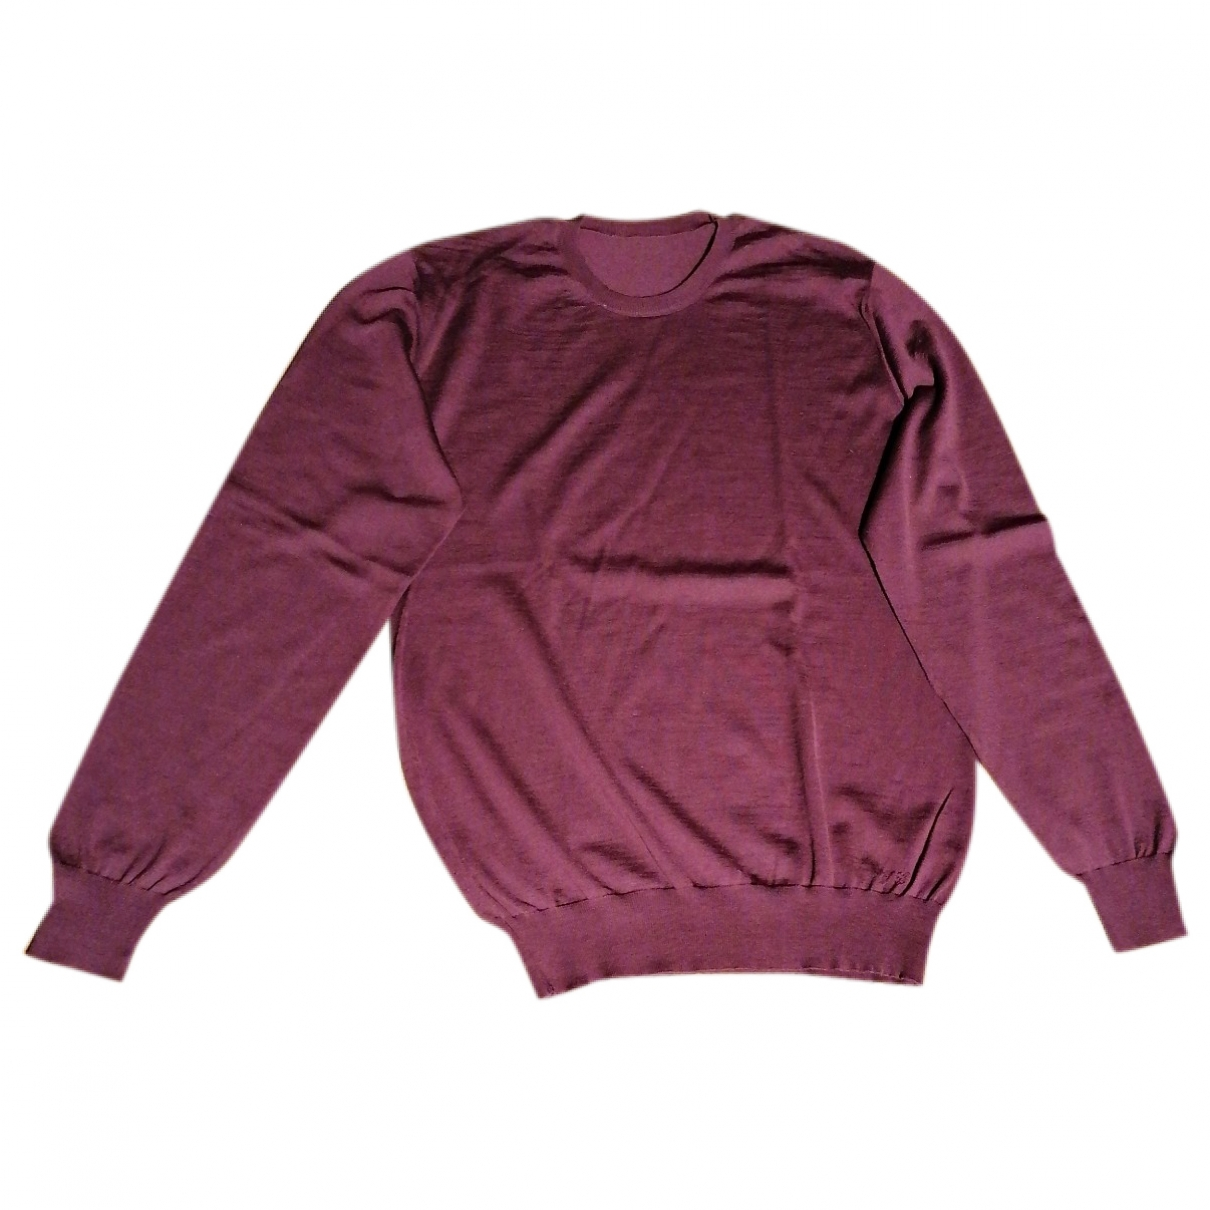 Yves Saint Laurent \N Burgundy Wool Knitwear & Sweatshirts for Men L International